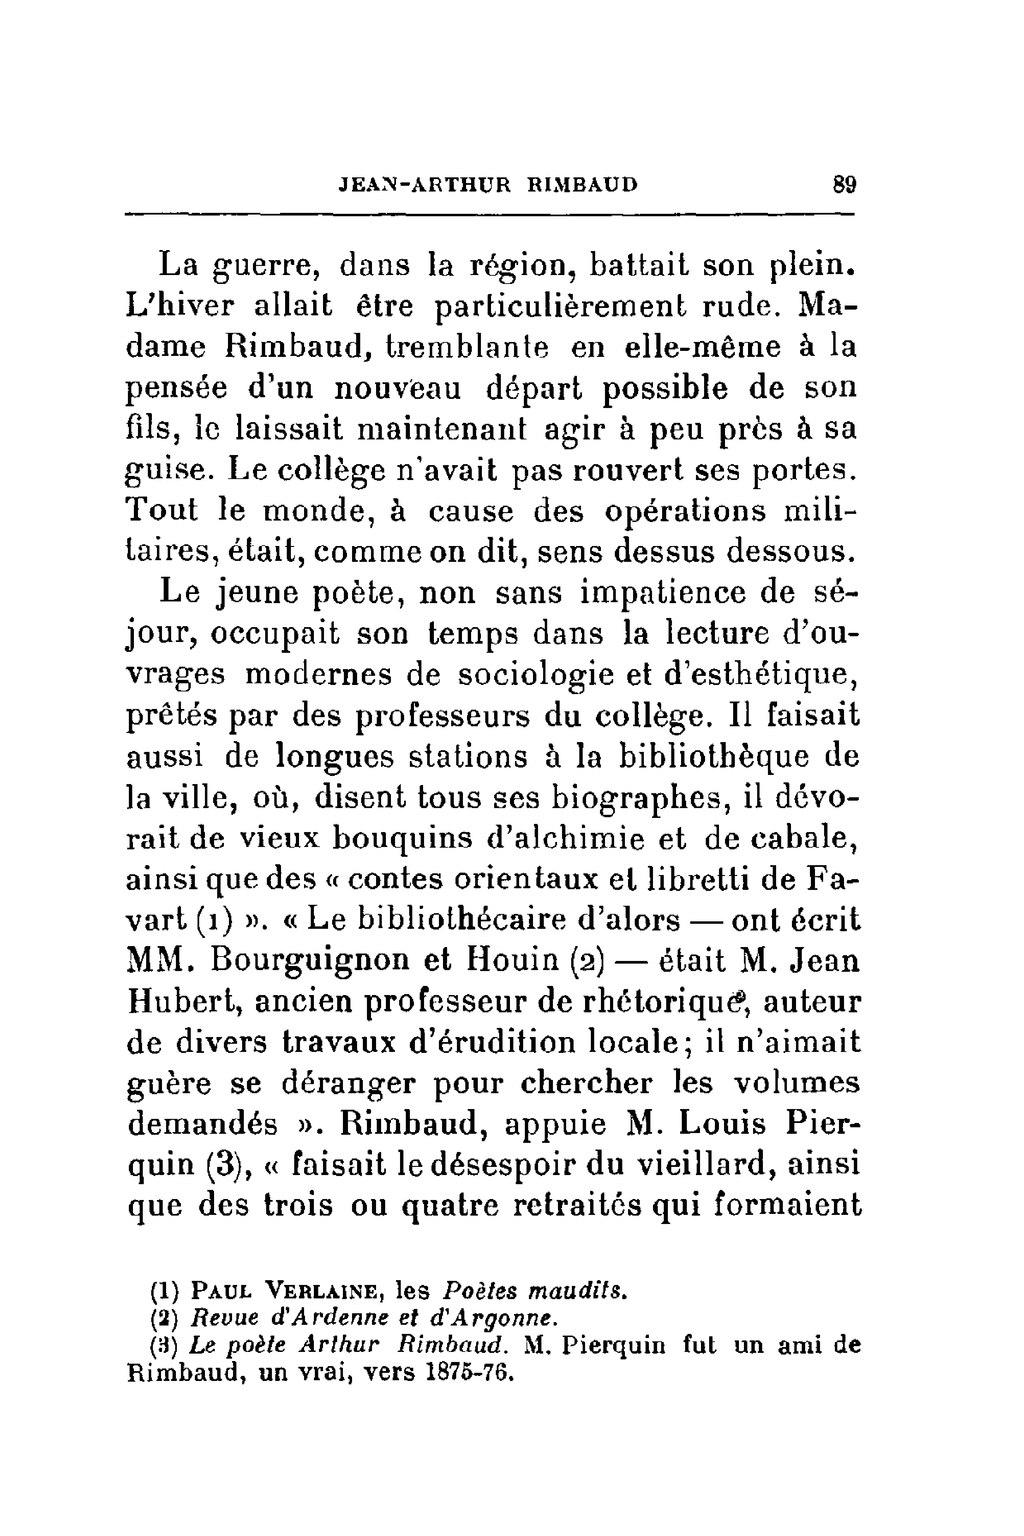 Pageberrichon Jean Arthur Rimbaud 1912djvu87 Wikisource